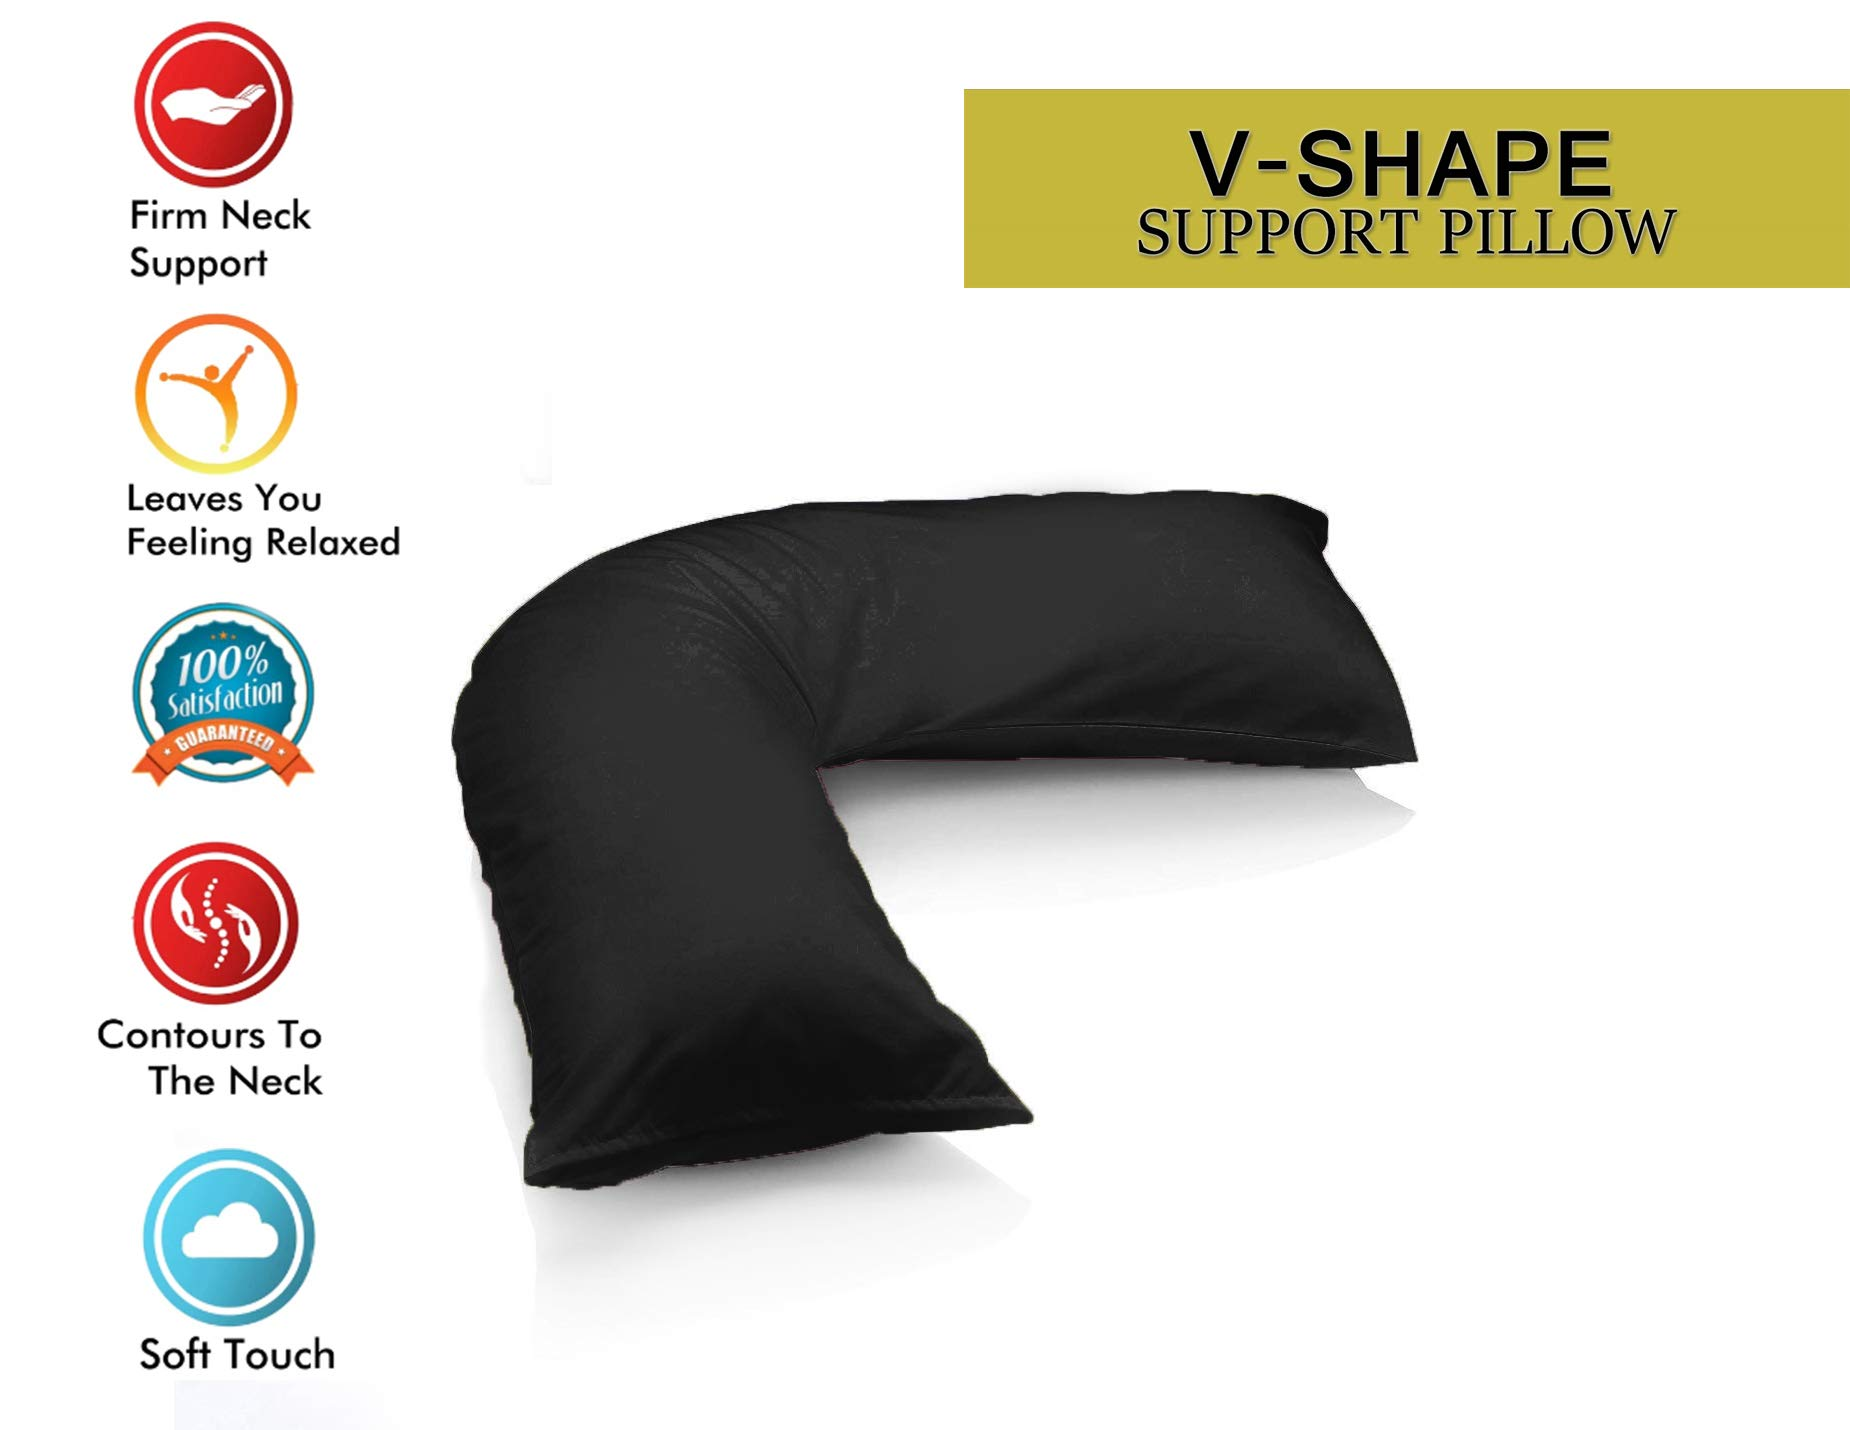 Back Neck Nursing V Shaped Support Pillow Case Pregnancy Reading Orthopaedic